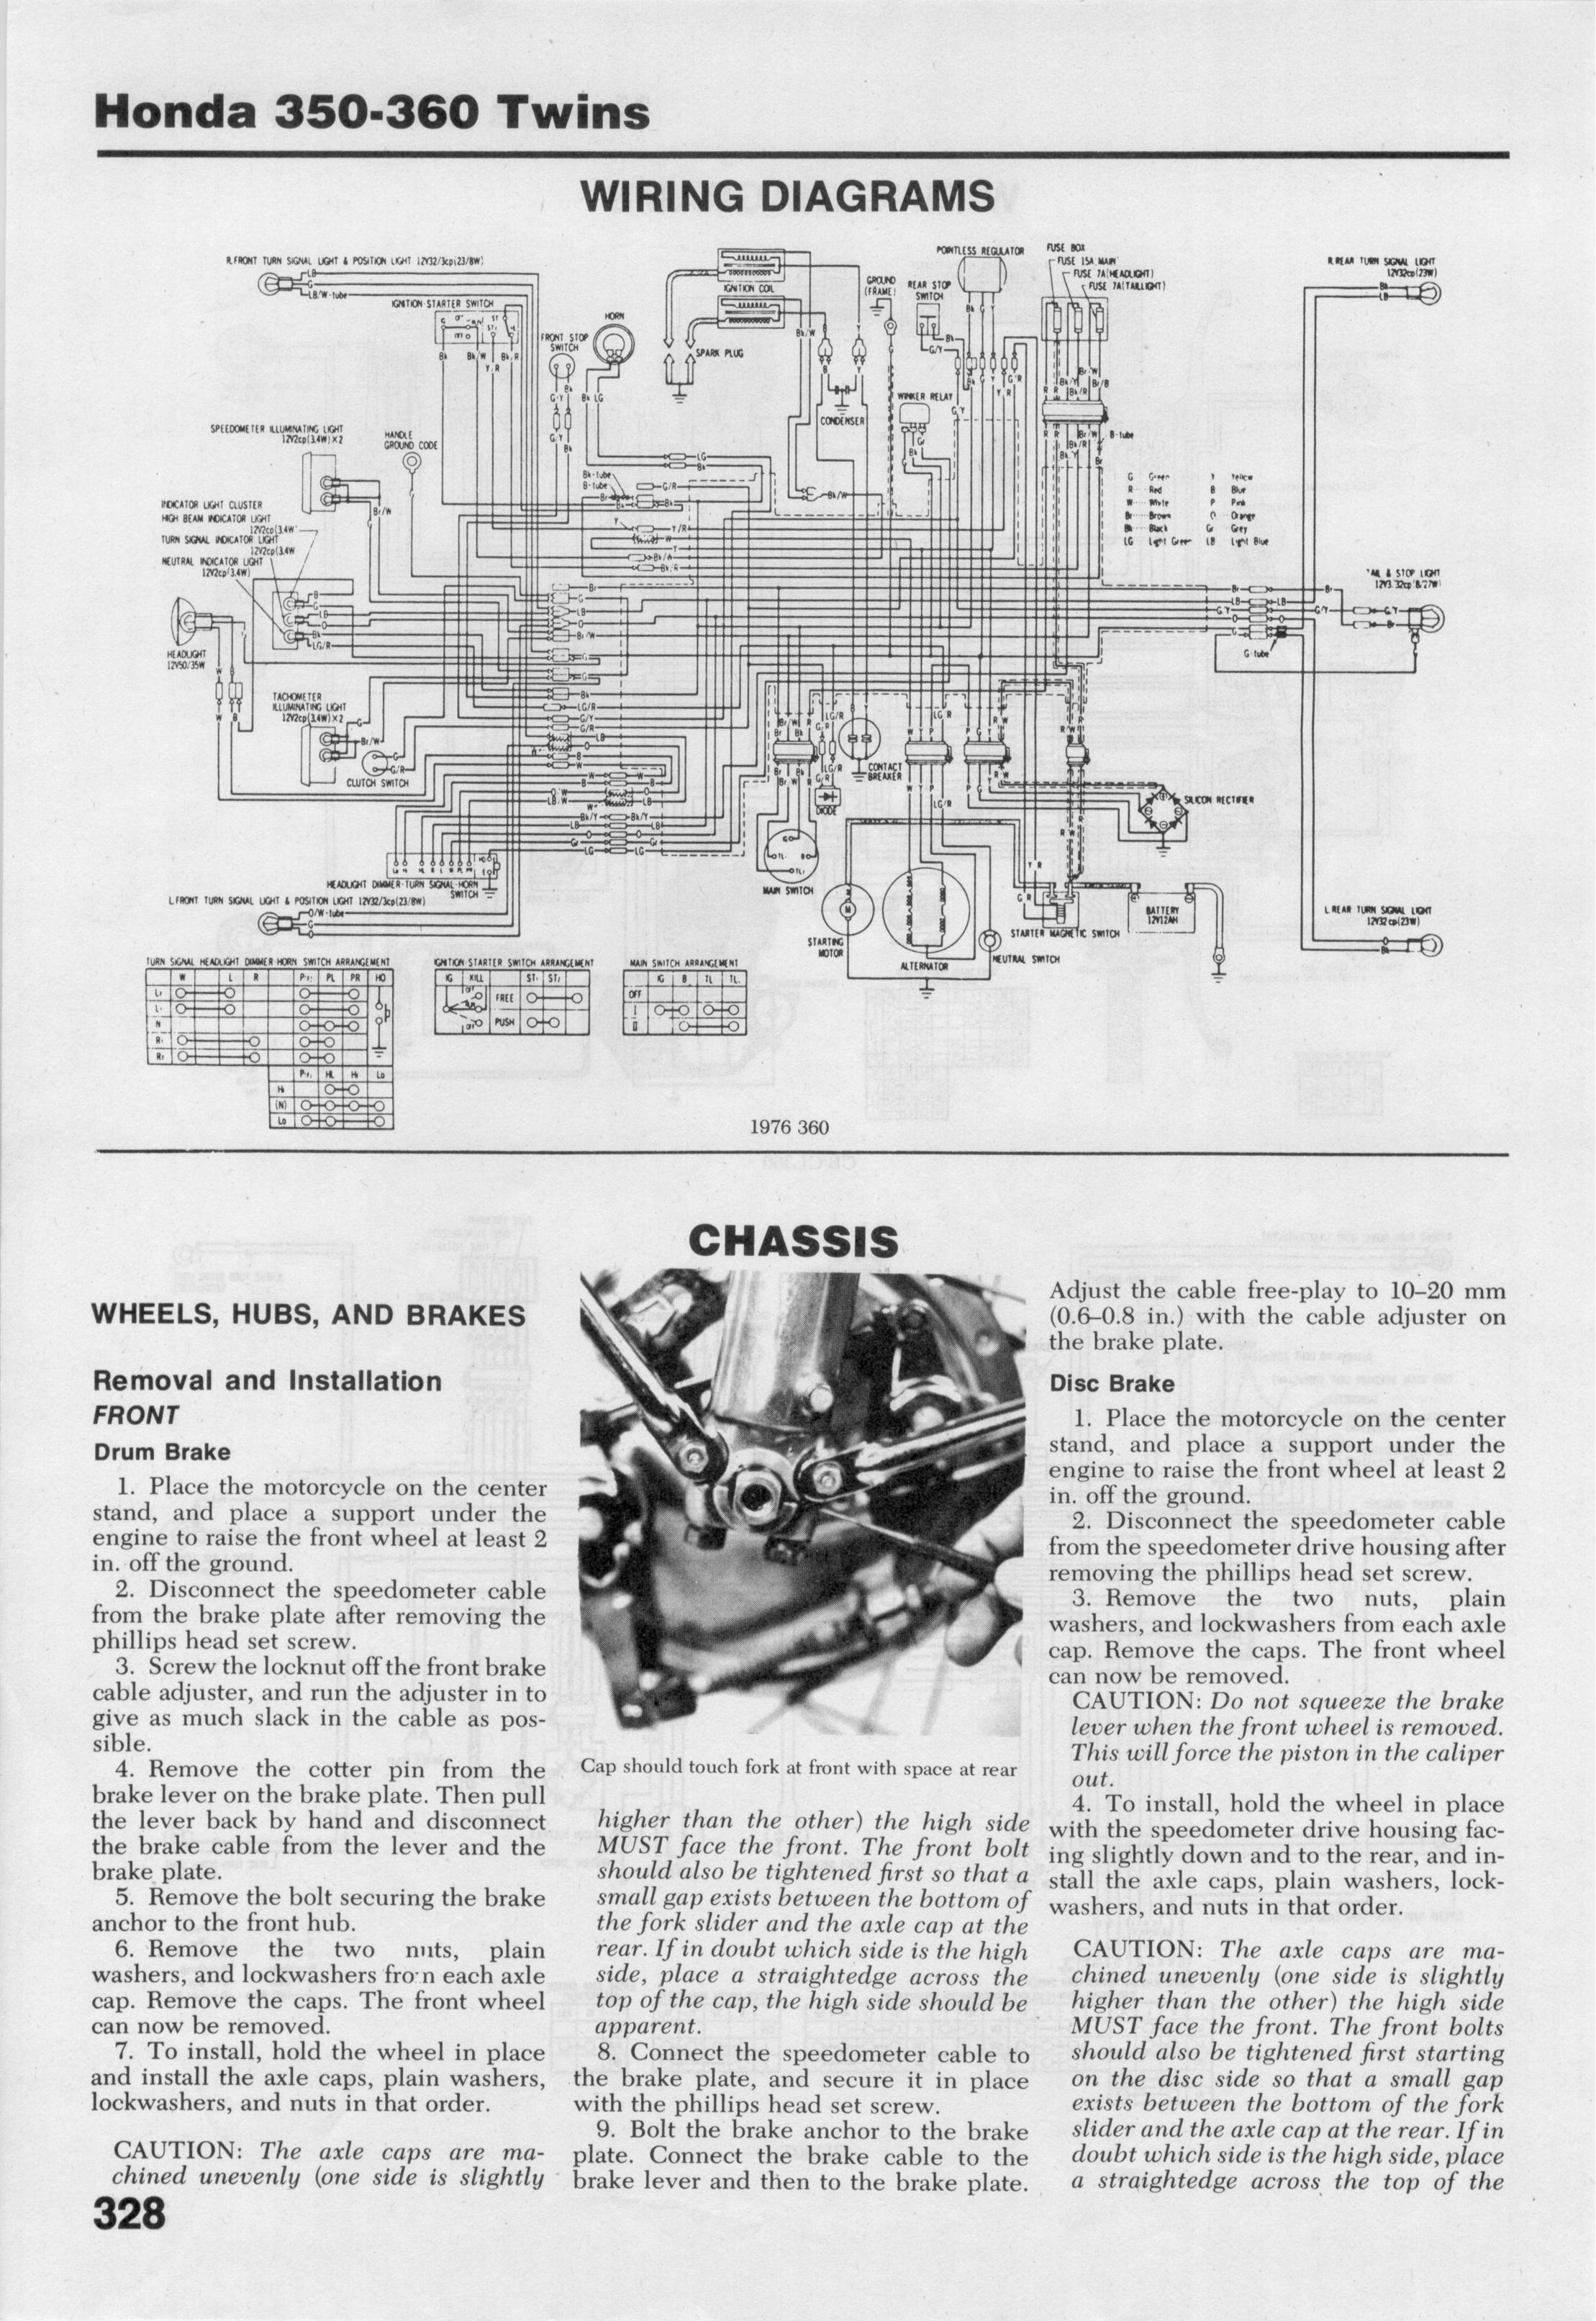 Honda Cb Cl 350 Microfiche Cl360 Wiring Diagram 1976 360 Chasis